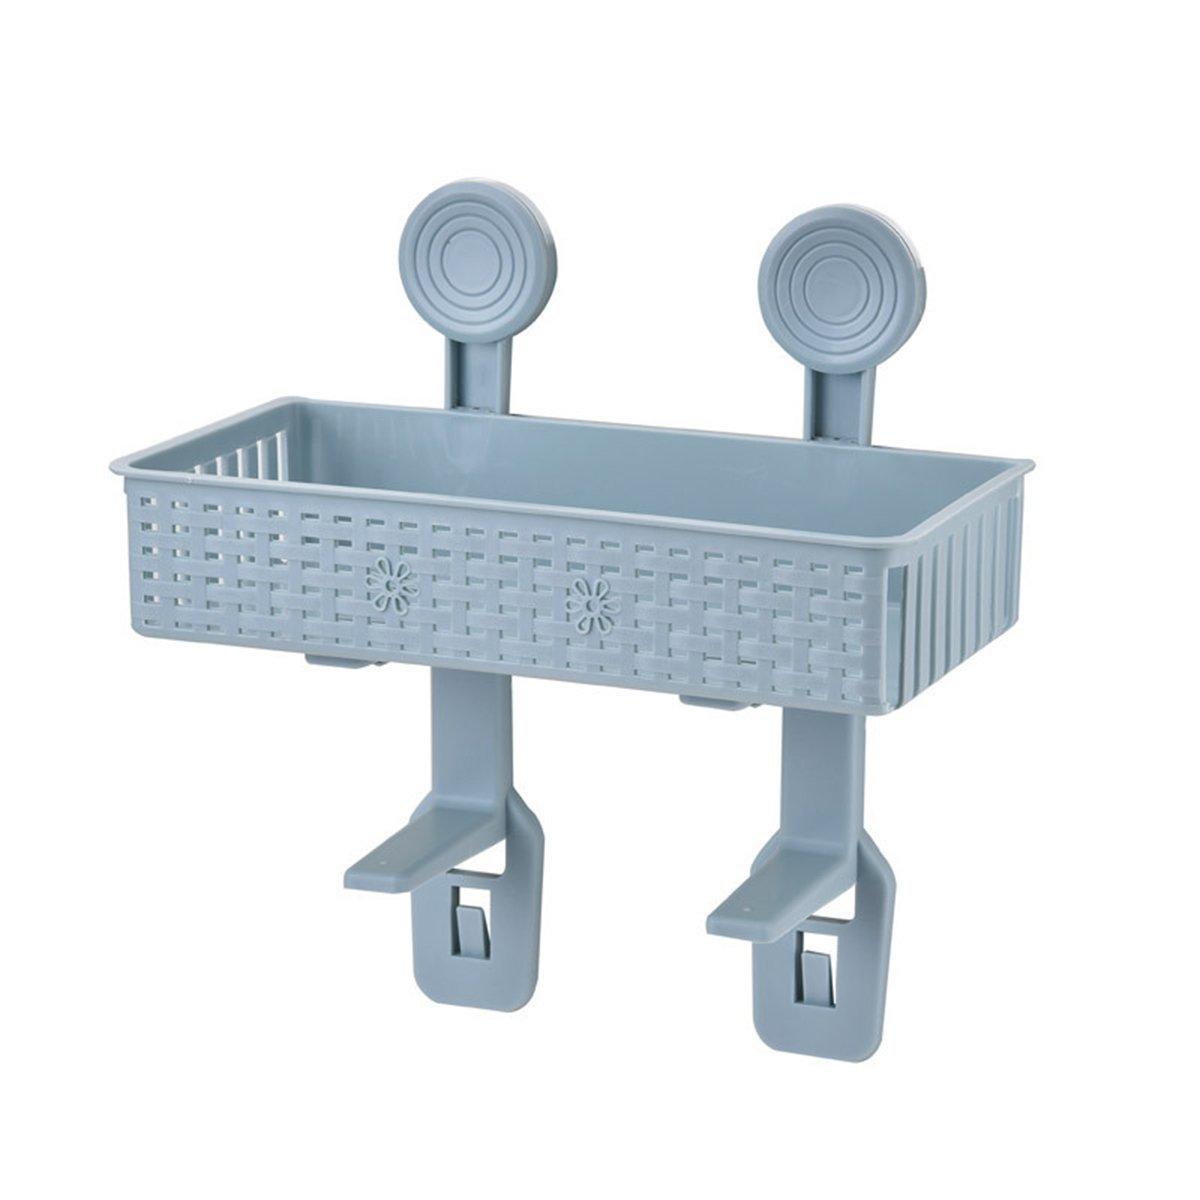 OUNONA Bathroom Basket Suction Cup Organizer Holder Wall Mounted Kitchen Toilet Shelf Storage Rack for Toilet Paper Shower Gel Shampoo (Blue)